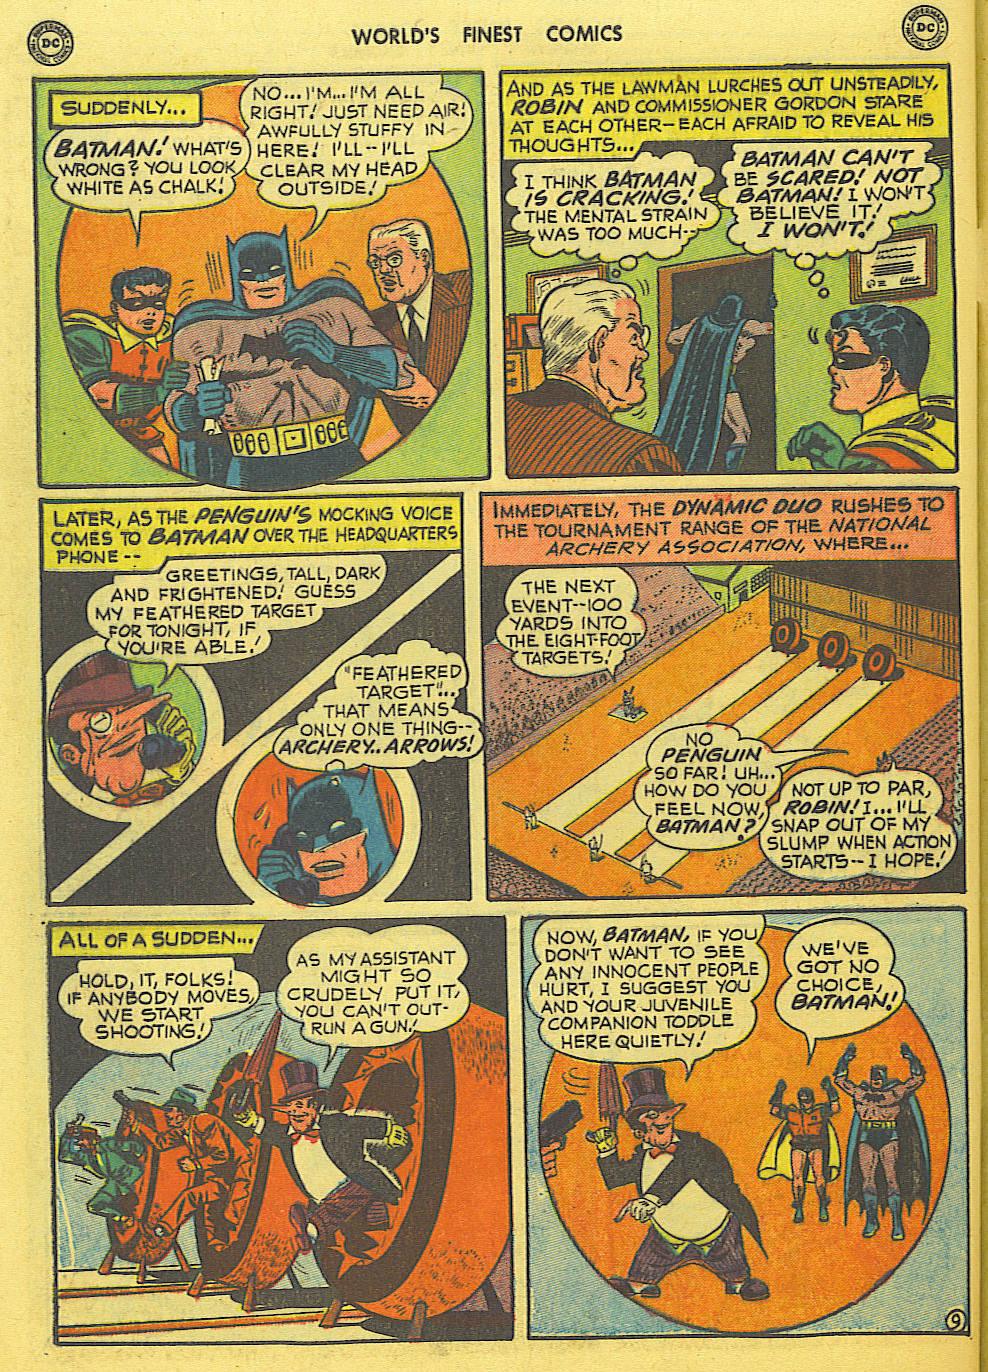 Read online World's Finest Comics comic -  Issue #49 - 71